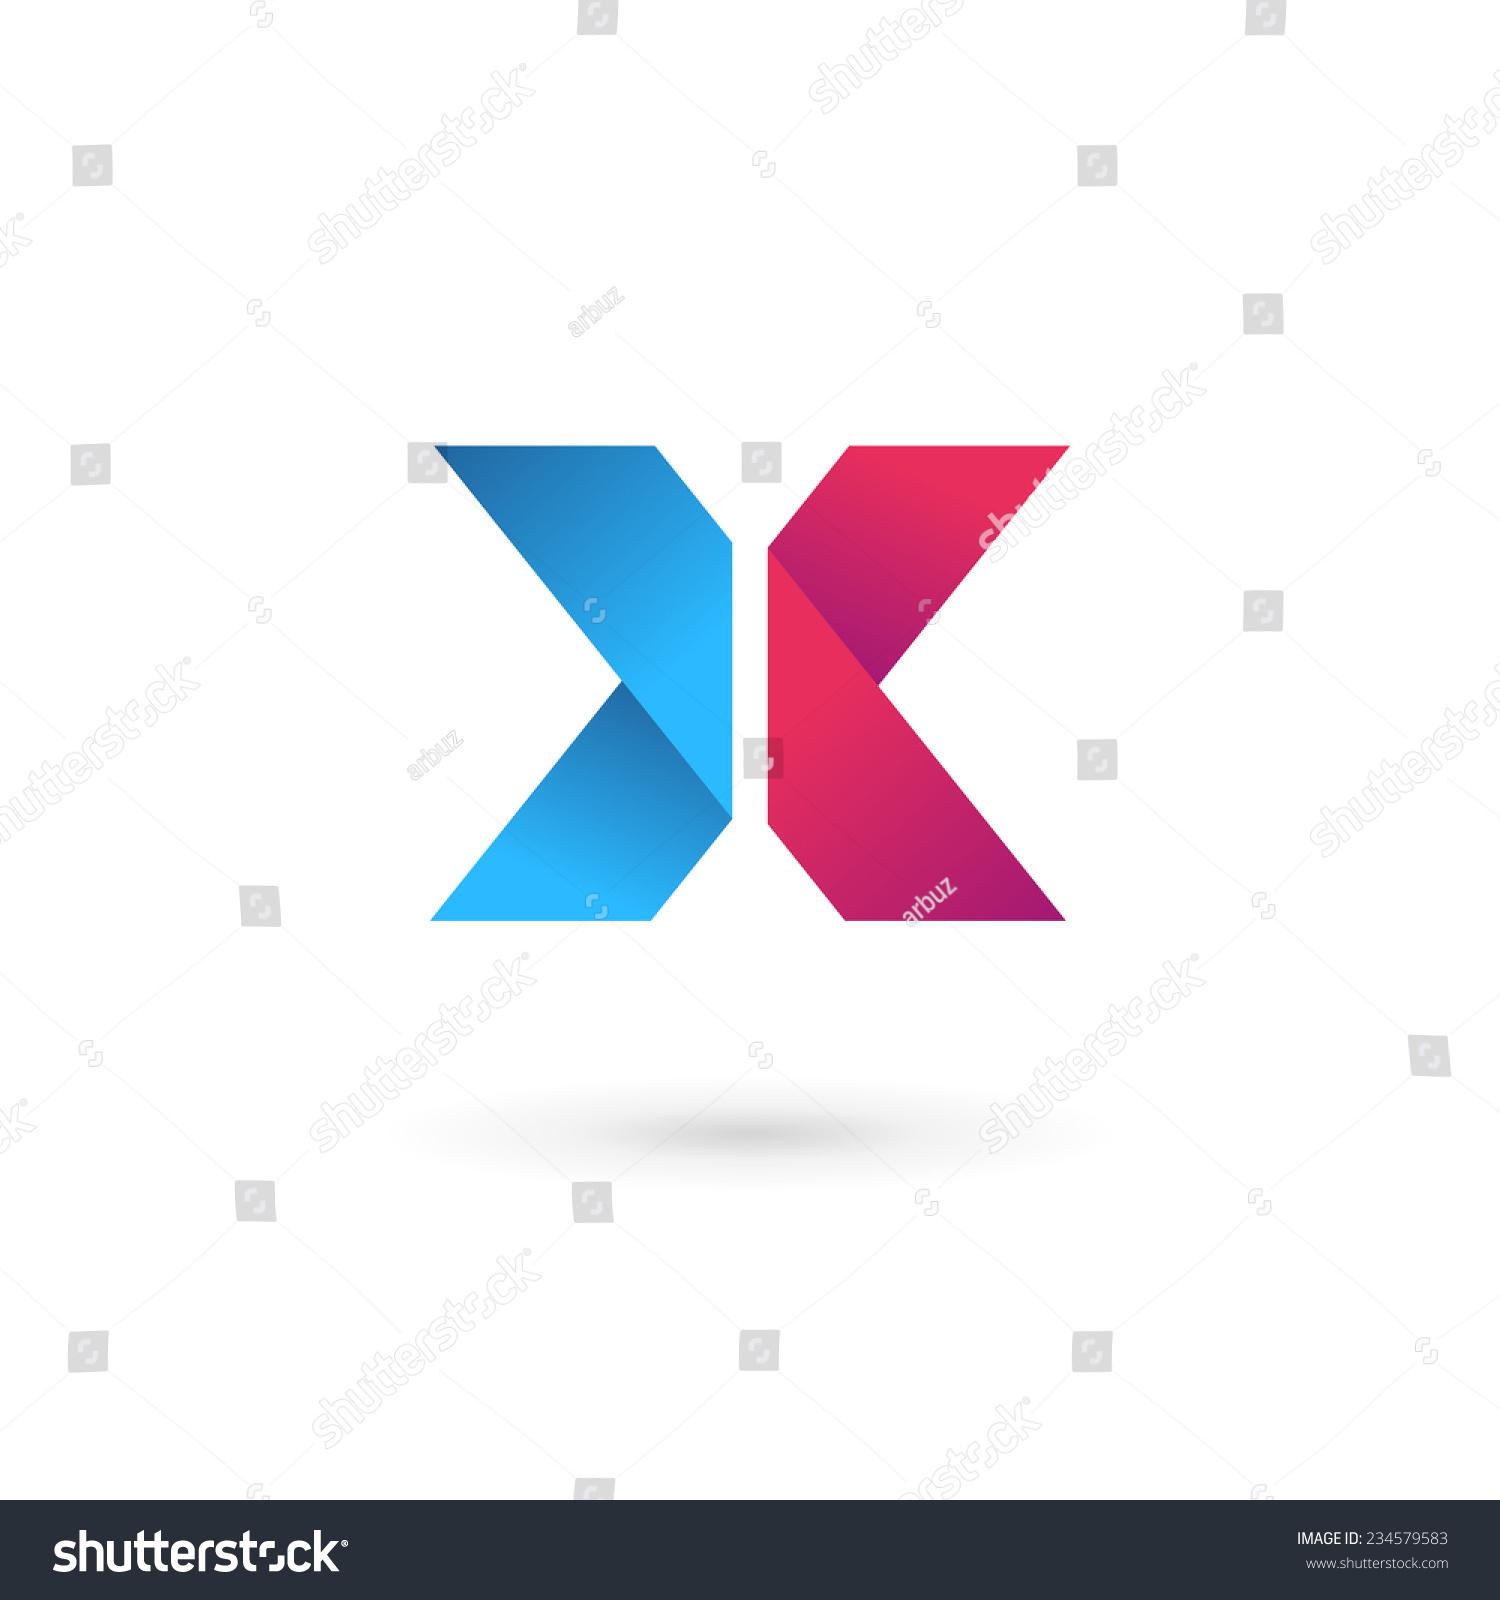 letter x logo icon design template stock vector 234579583 shutterstock. Black Bedroom Furniture Sets. Home Design Ideas